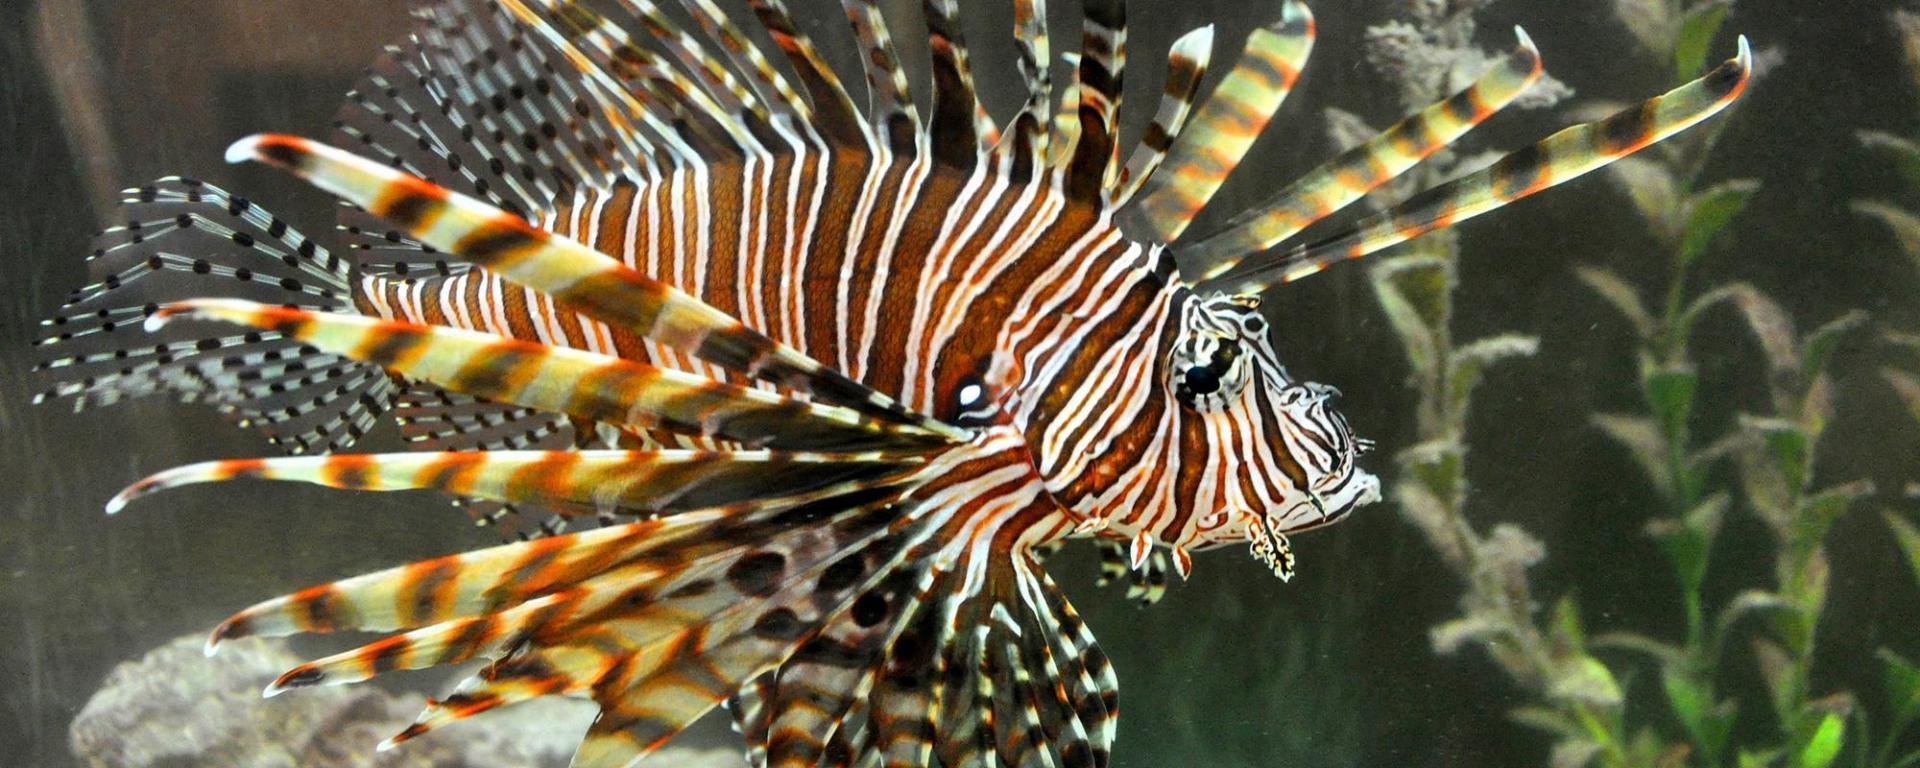 Lionfish/FWC